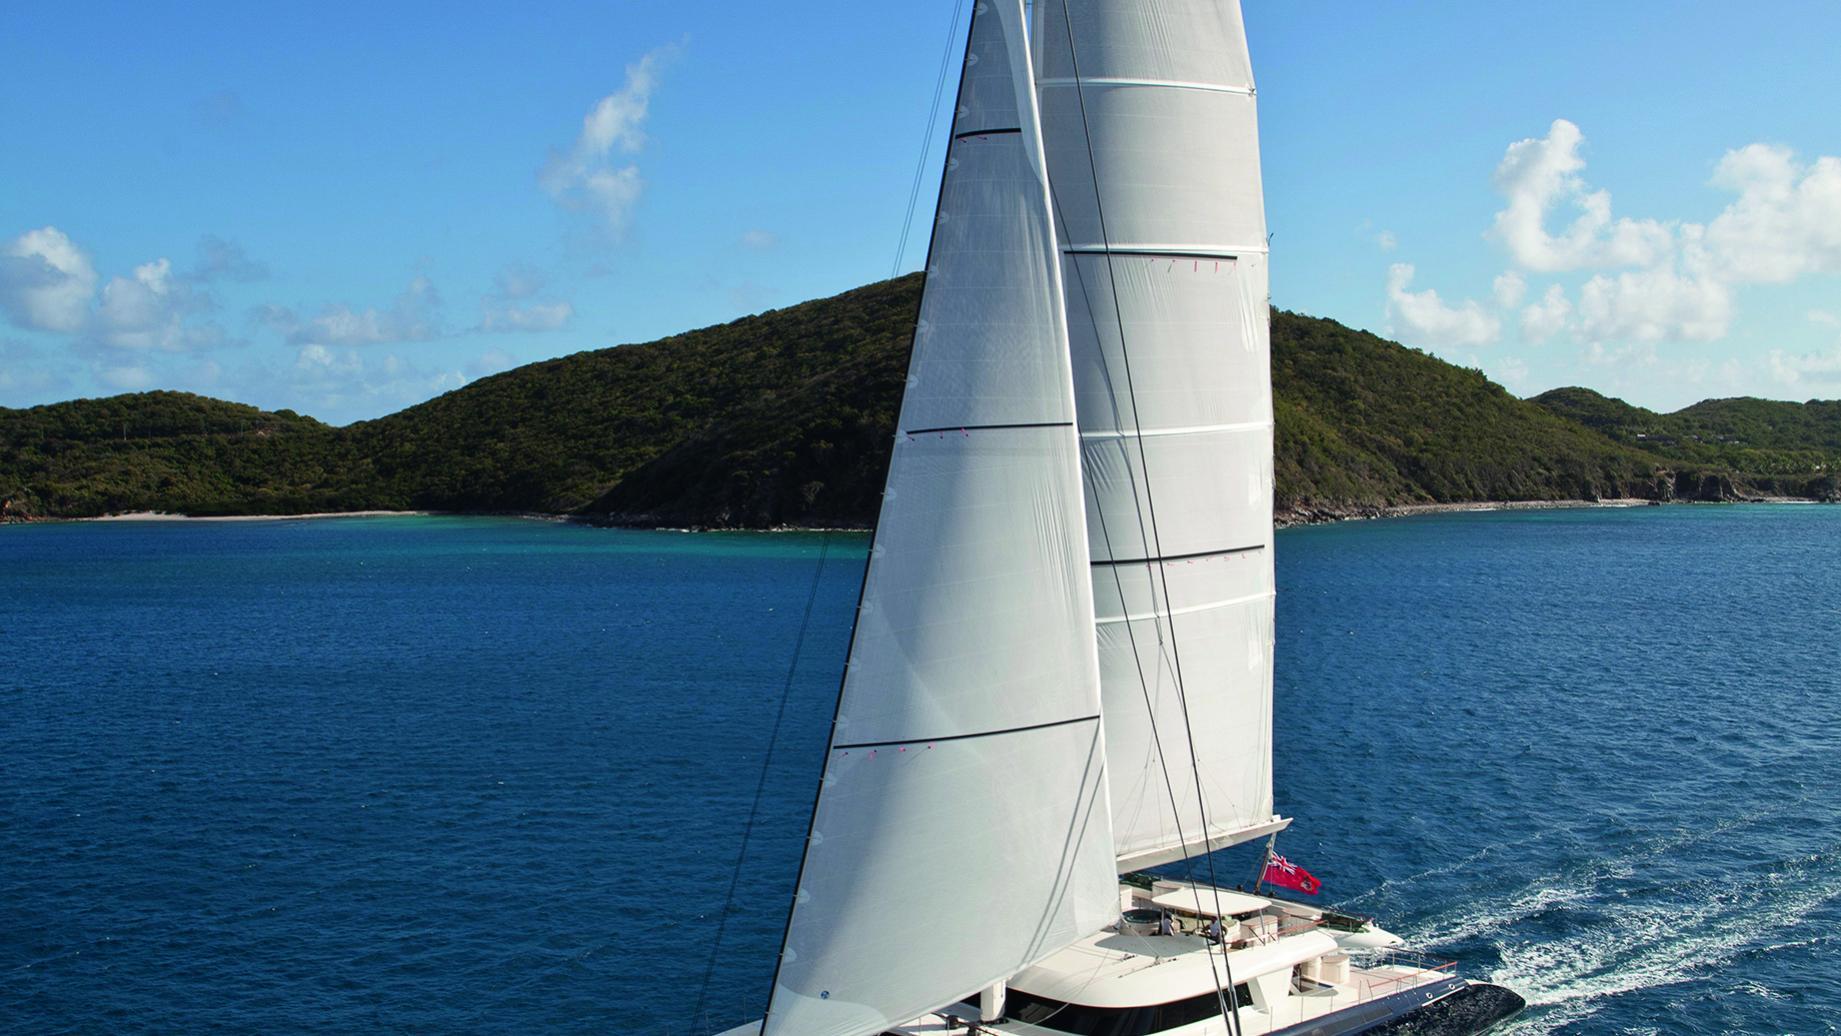 hemisphere-sailing-yacht-pendennis-2011-44m-half-profile-aerial